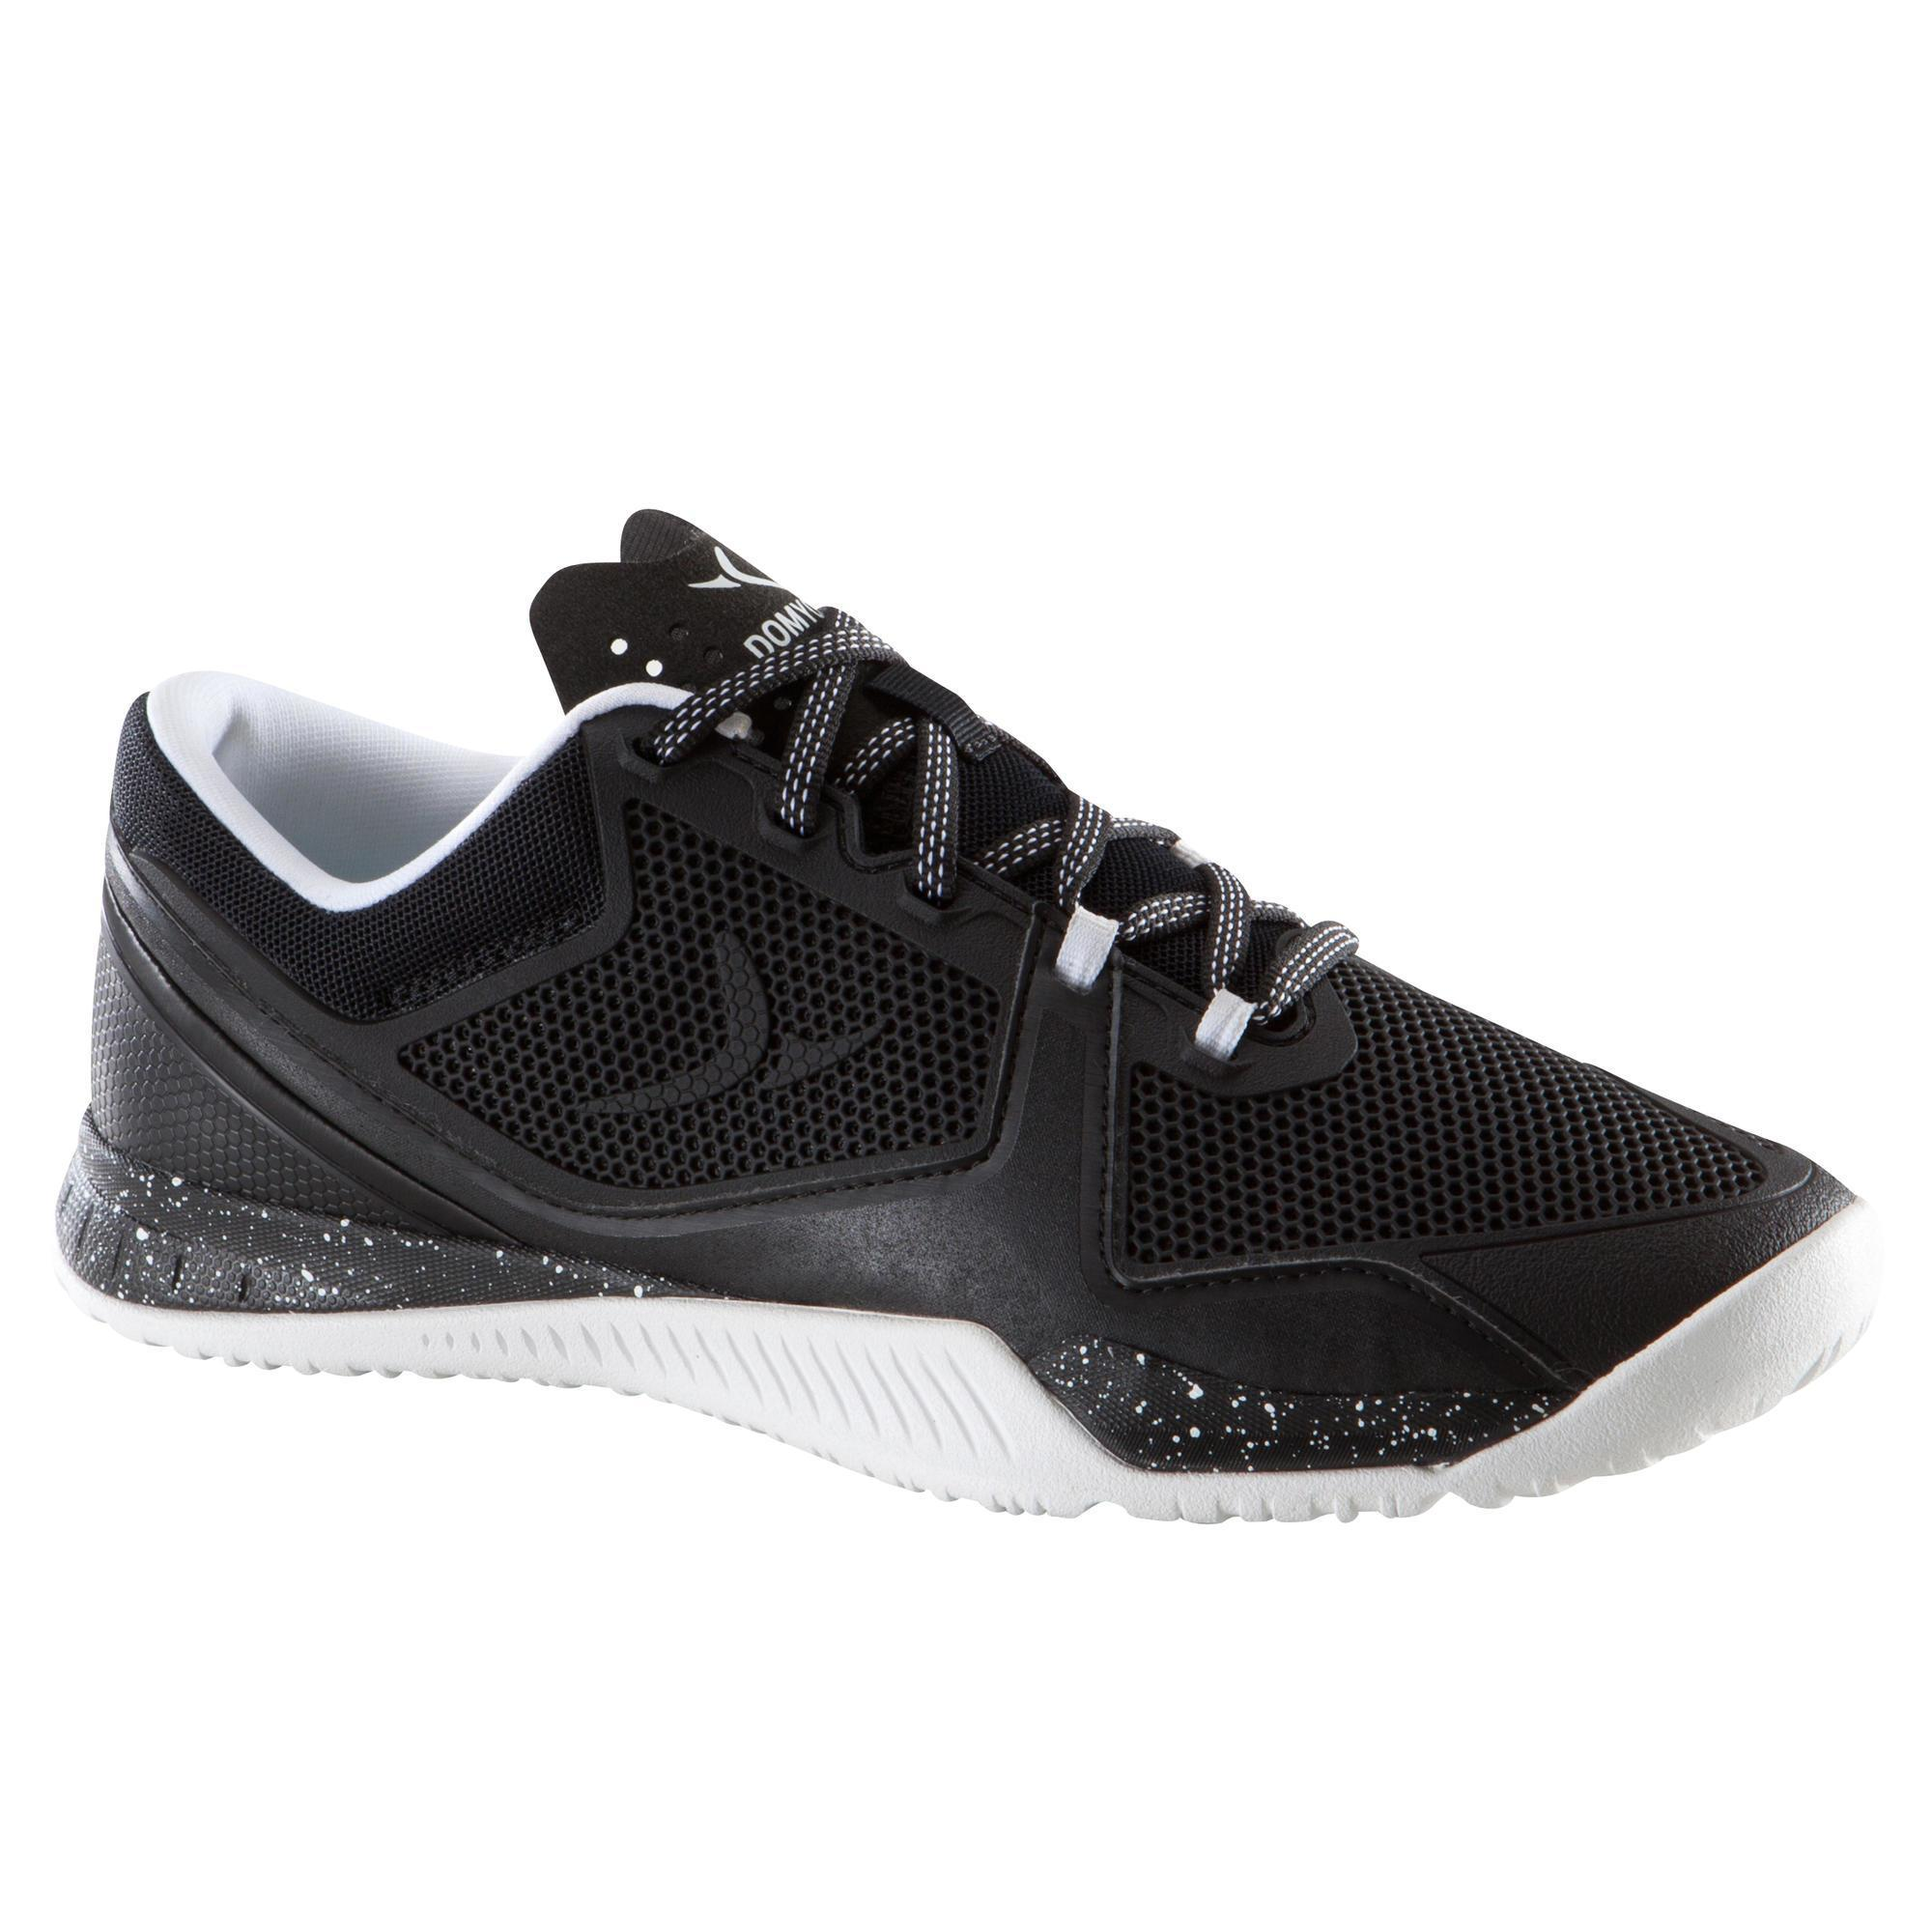 Strong 900 Women's Cross-Training Shoes